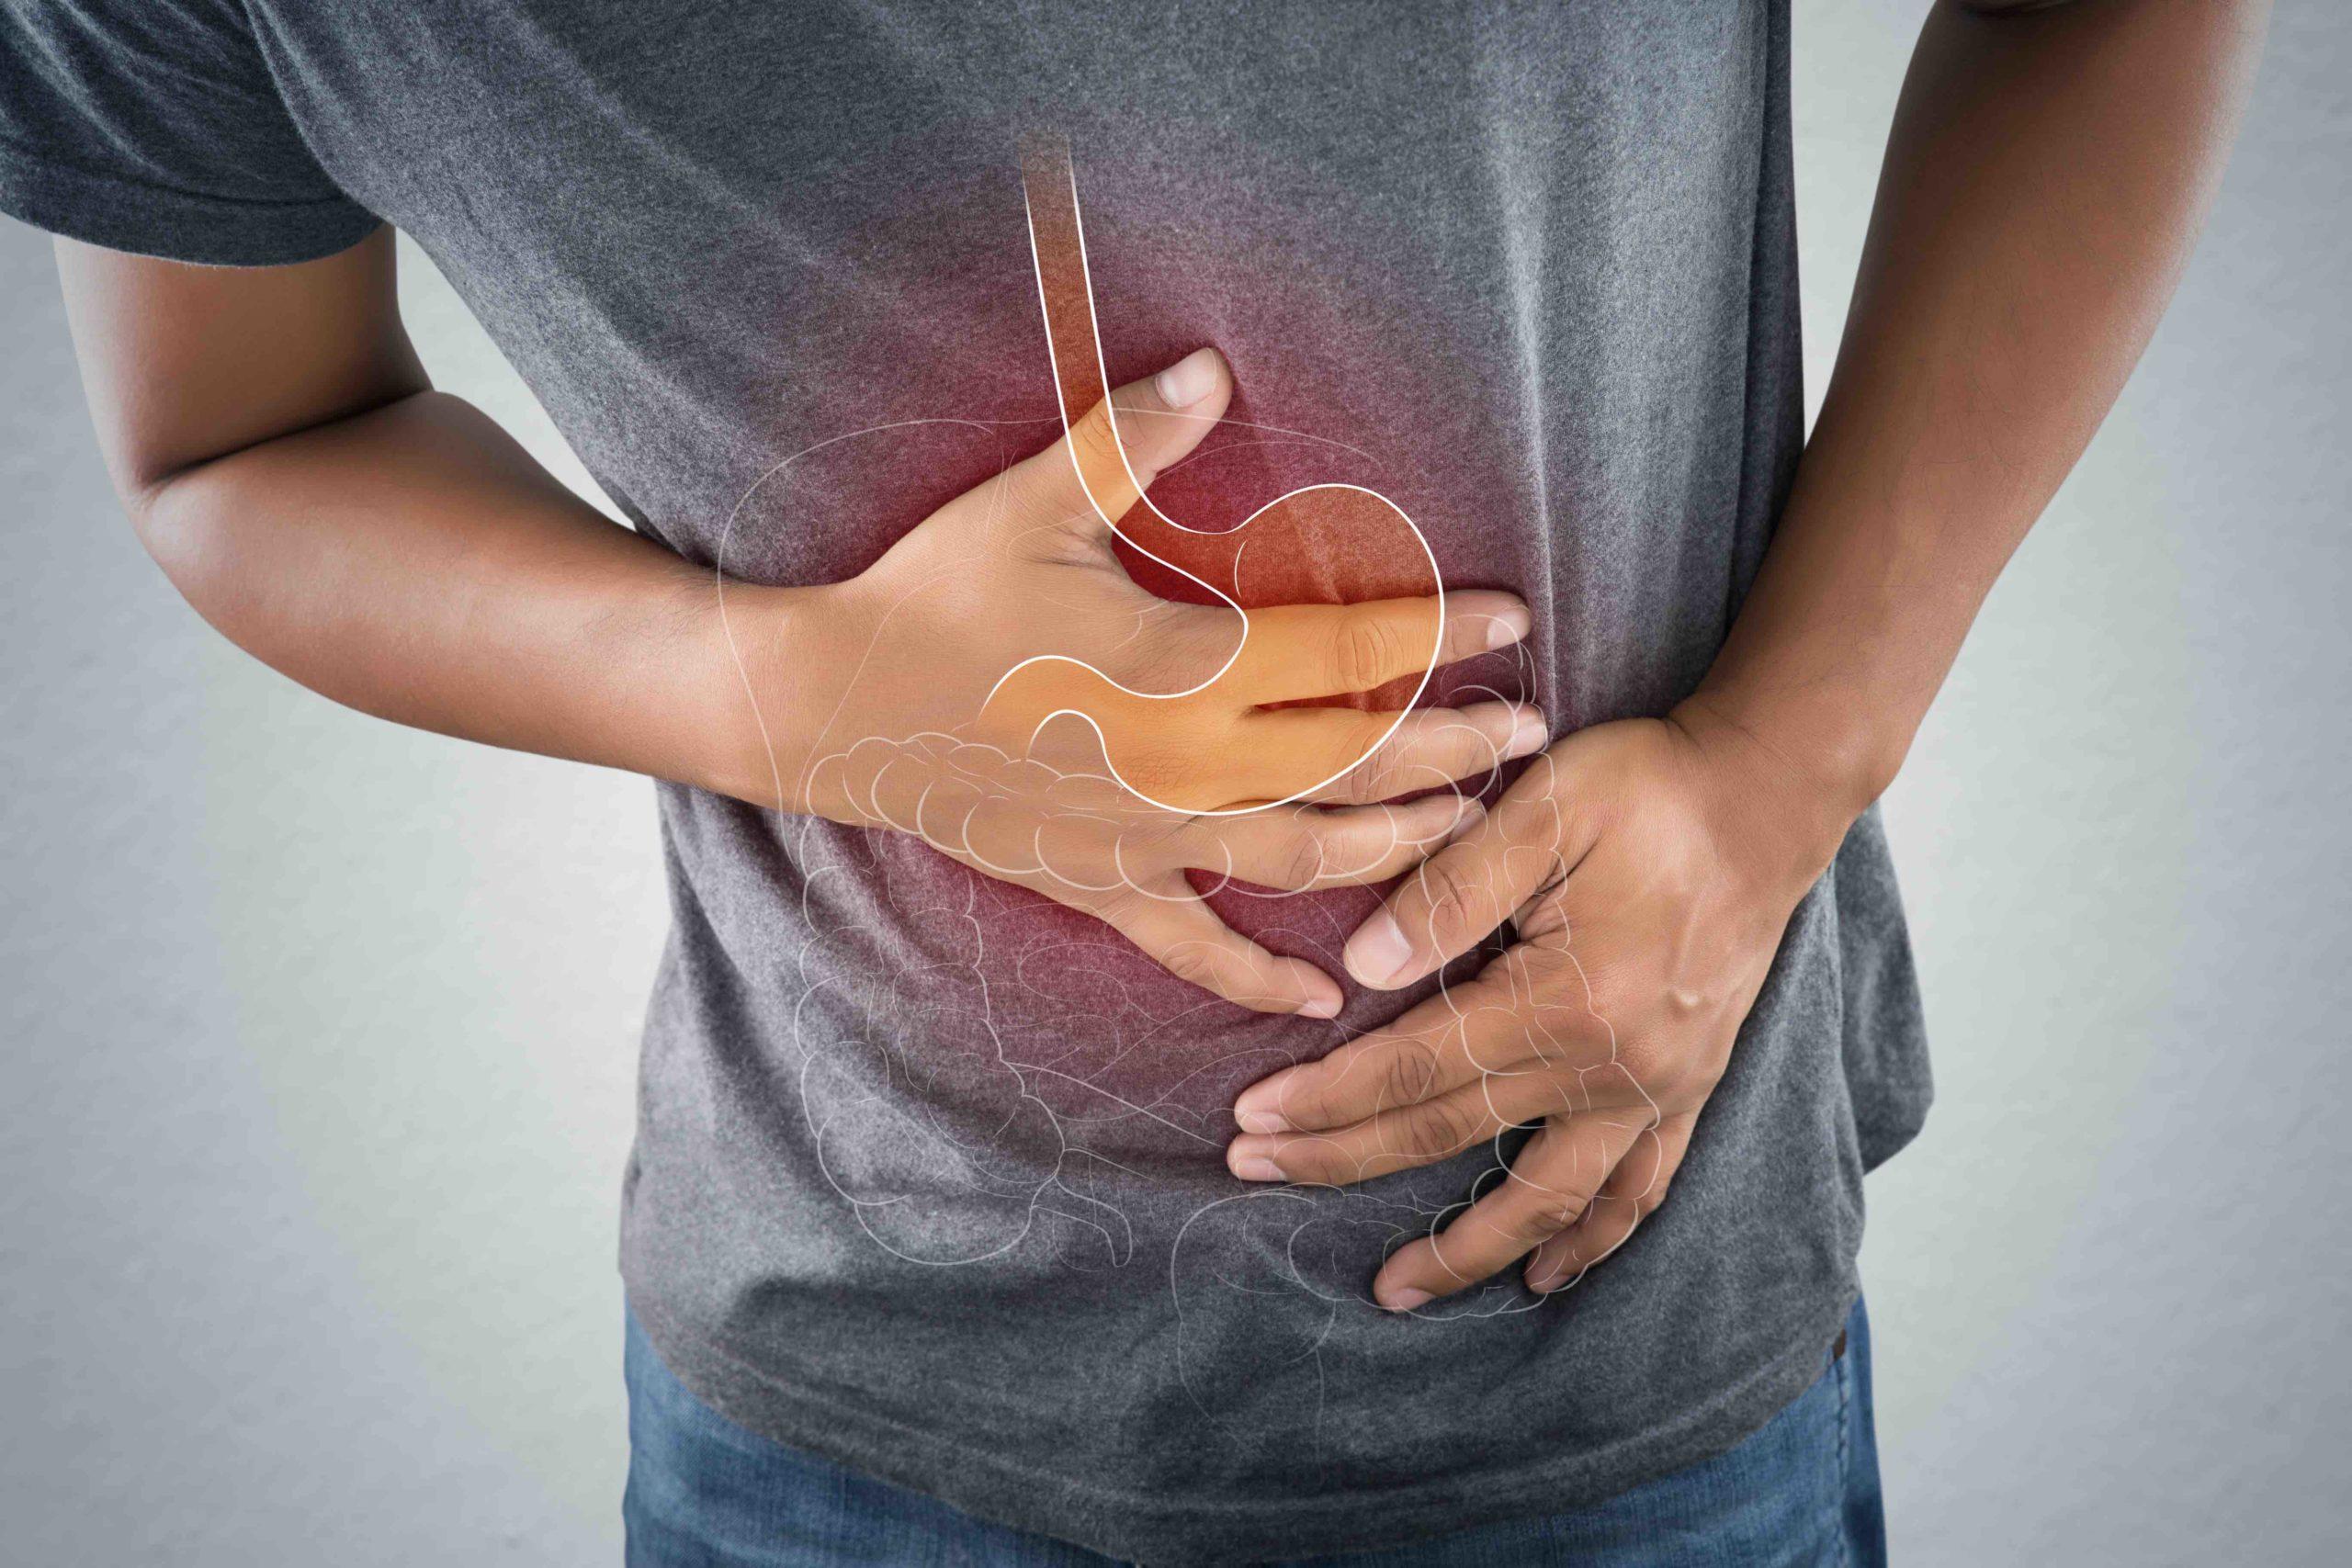 cure thermale pour les affections digestives